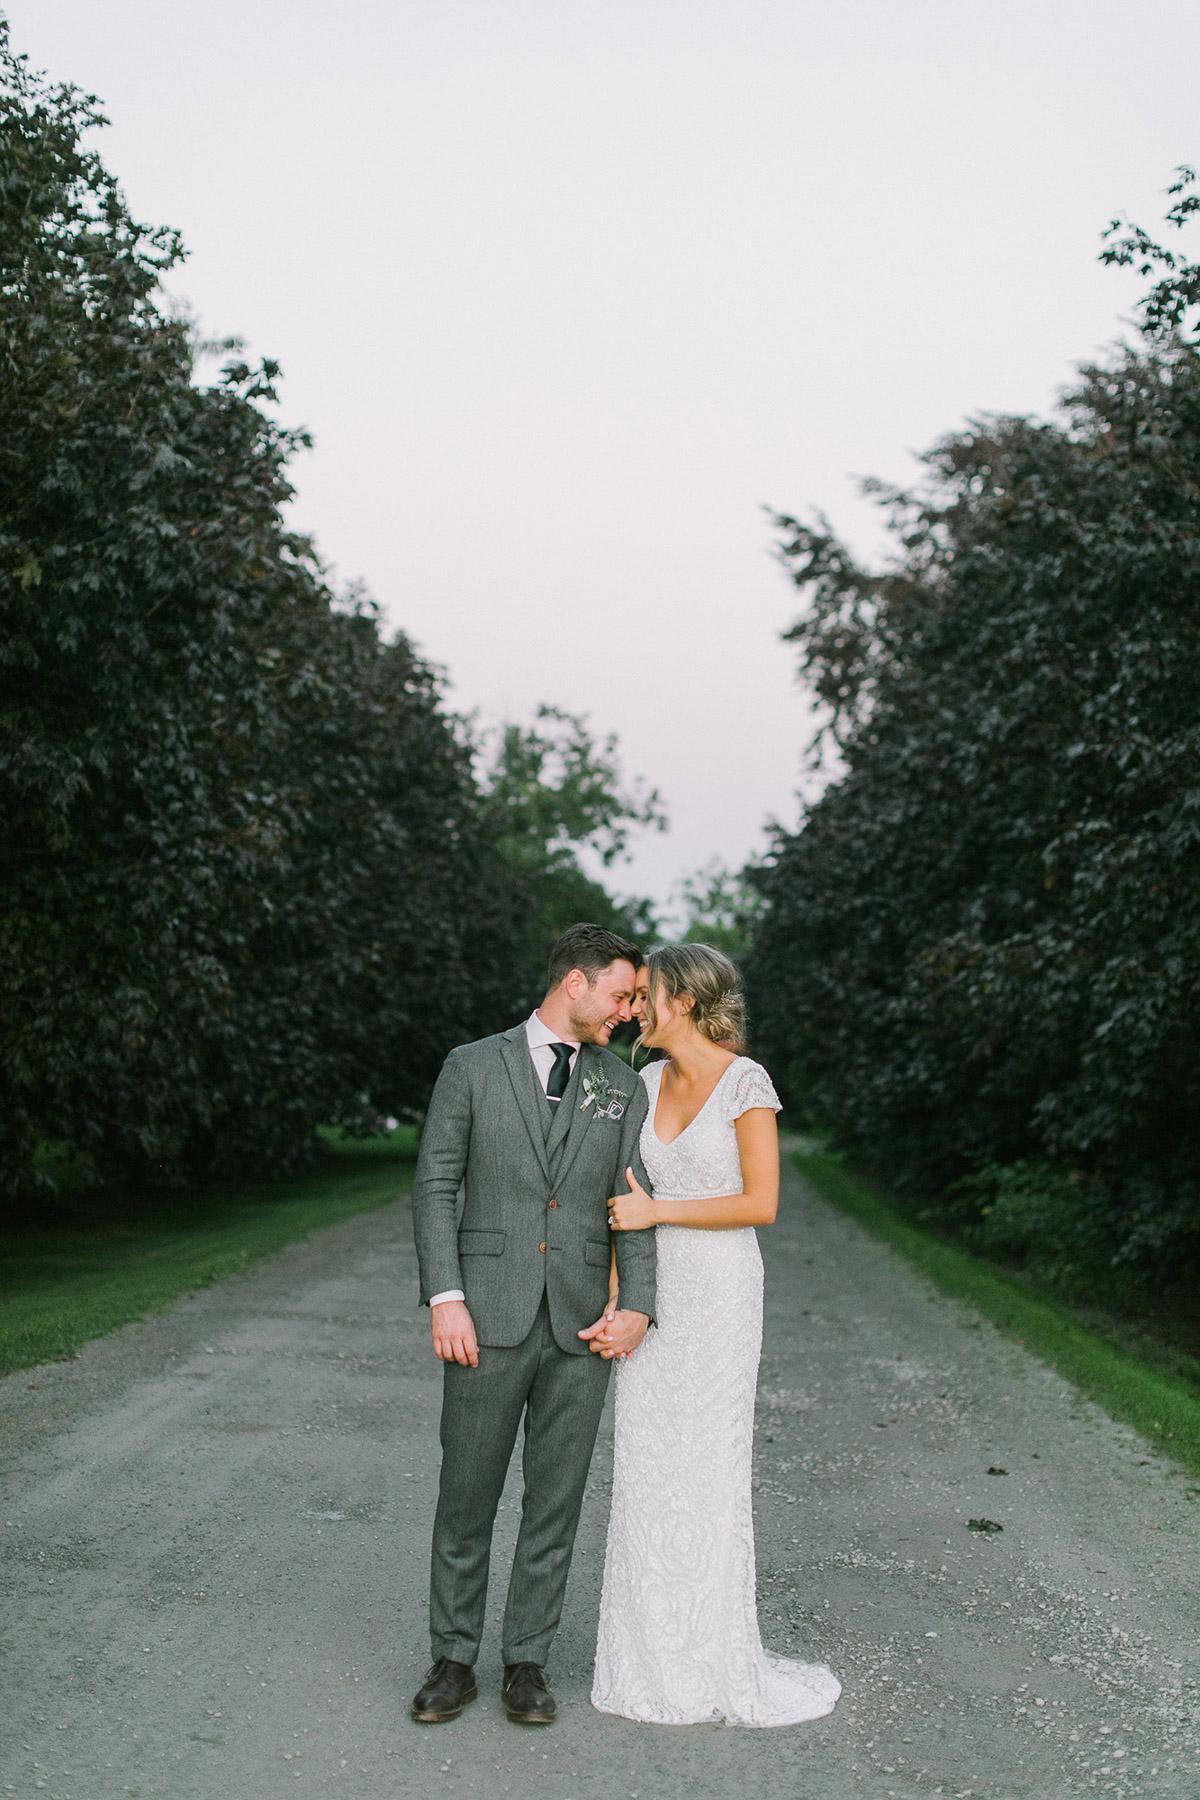 elizabeth-in-love-vineyard-bride-swish-list-cherry-avenue-farms-vineland-wedding-60.jpg